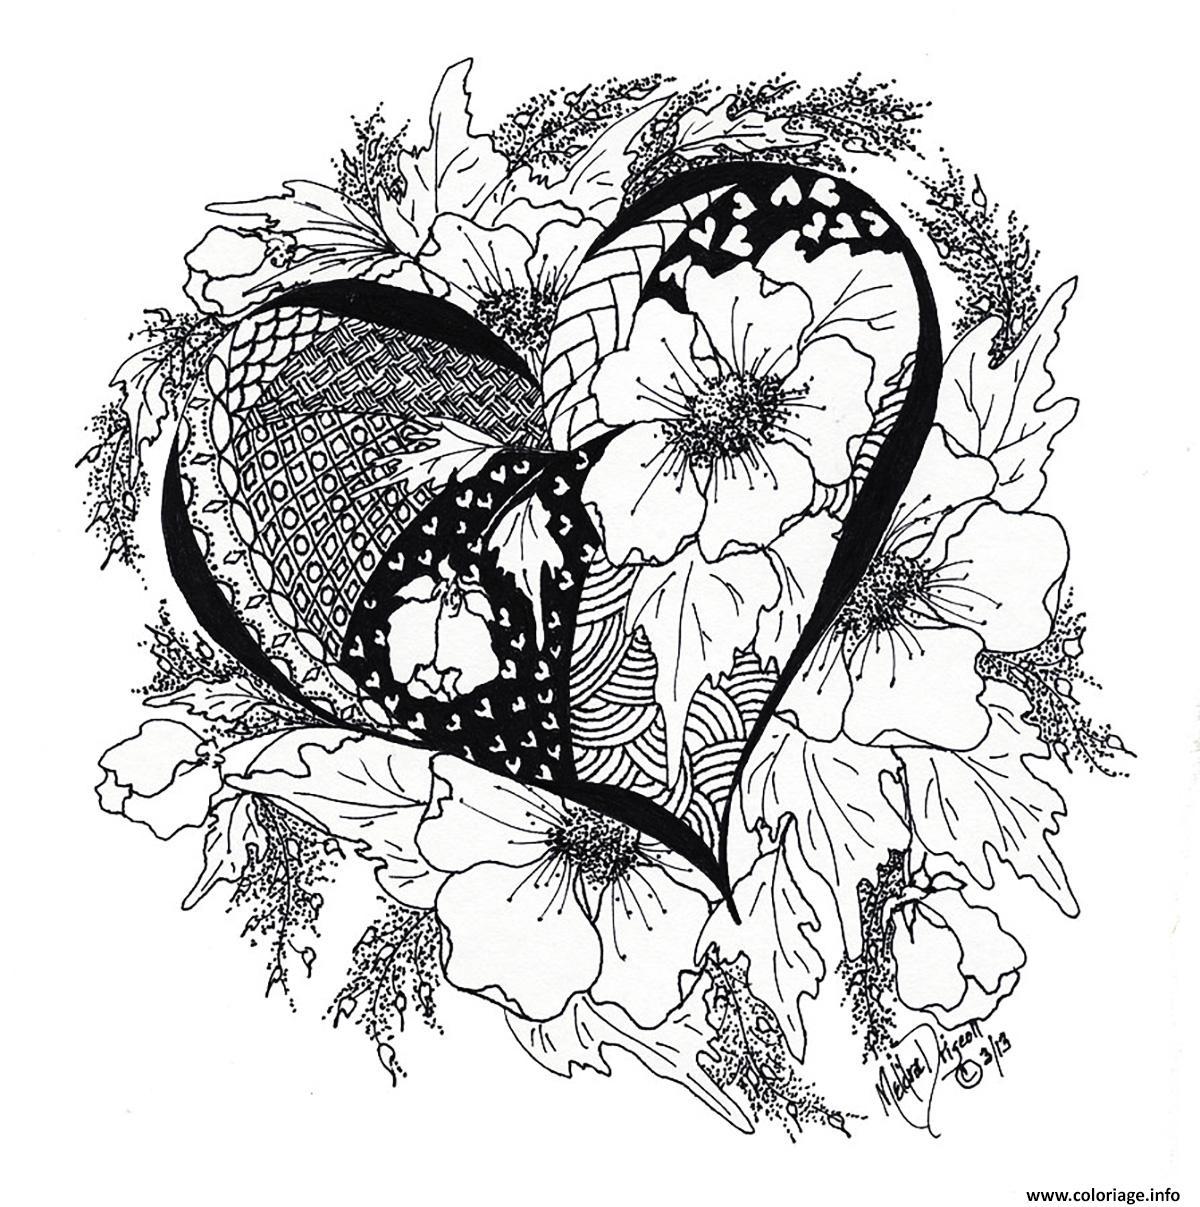 Coloriage Adulte Coeur.Coloriage Adulte Coeur Amour 5 Jecolorie Com